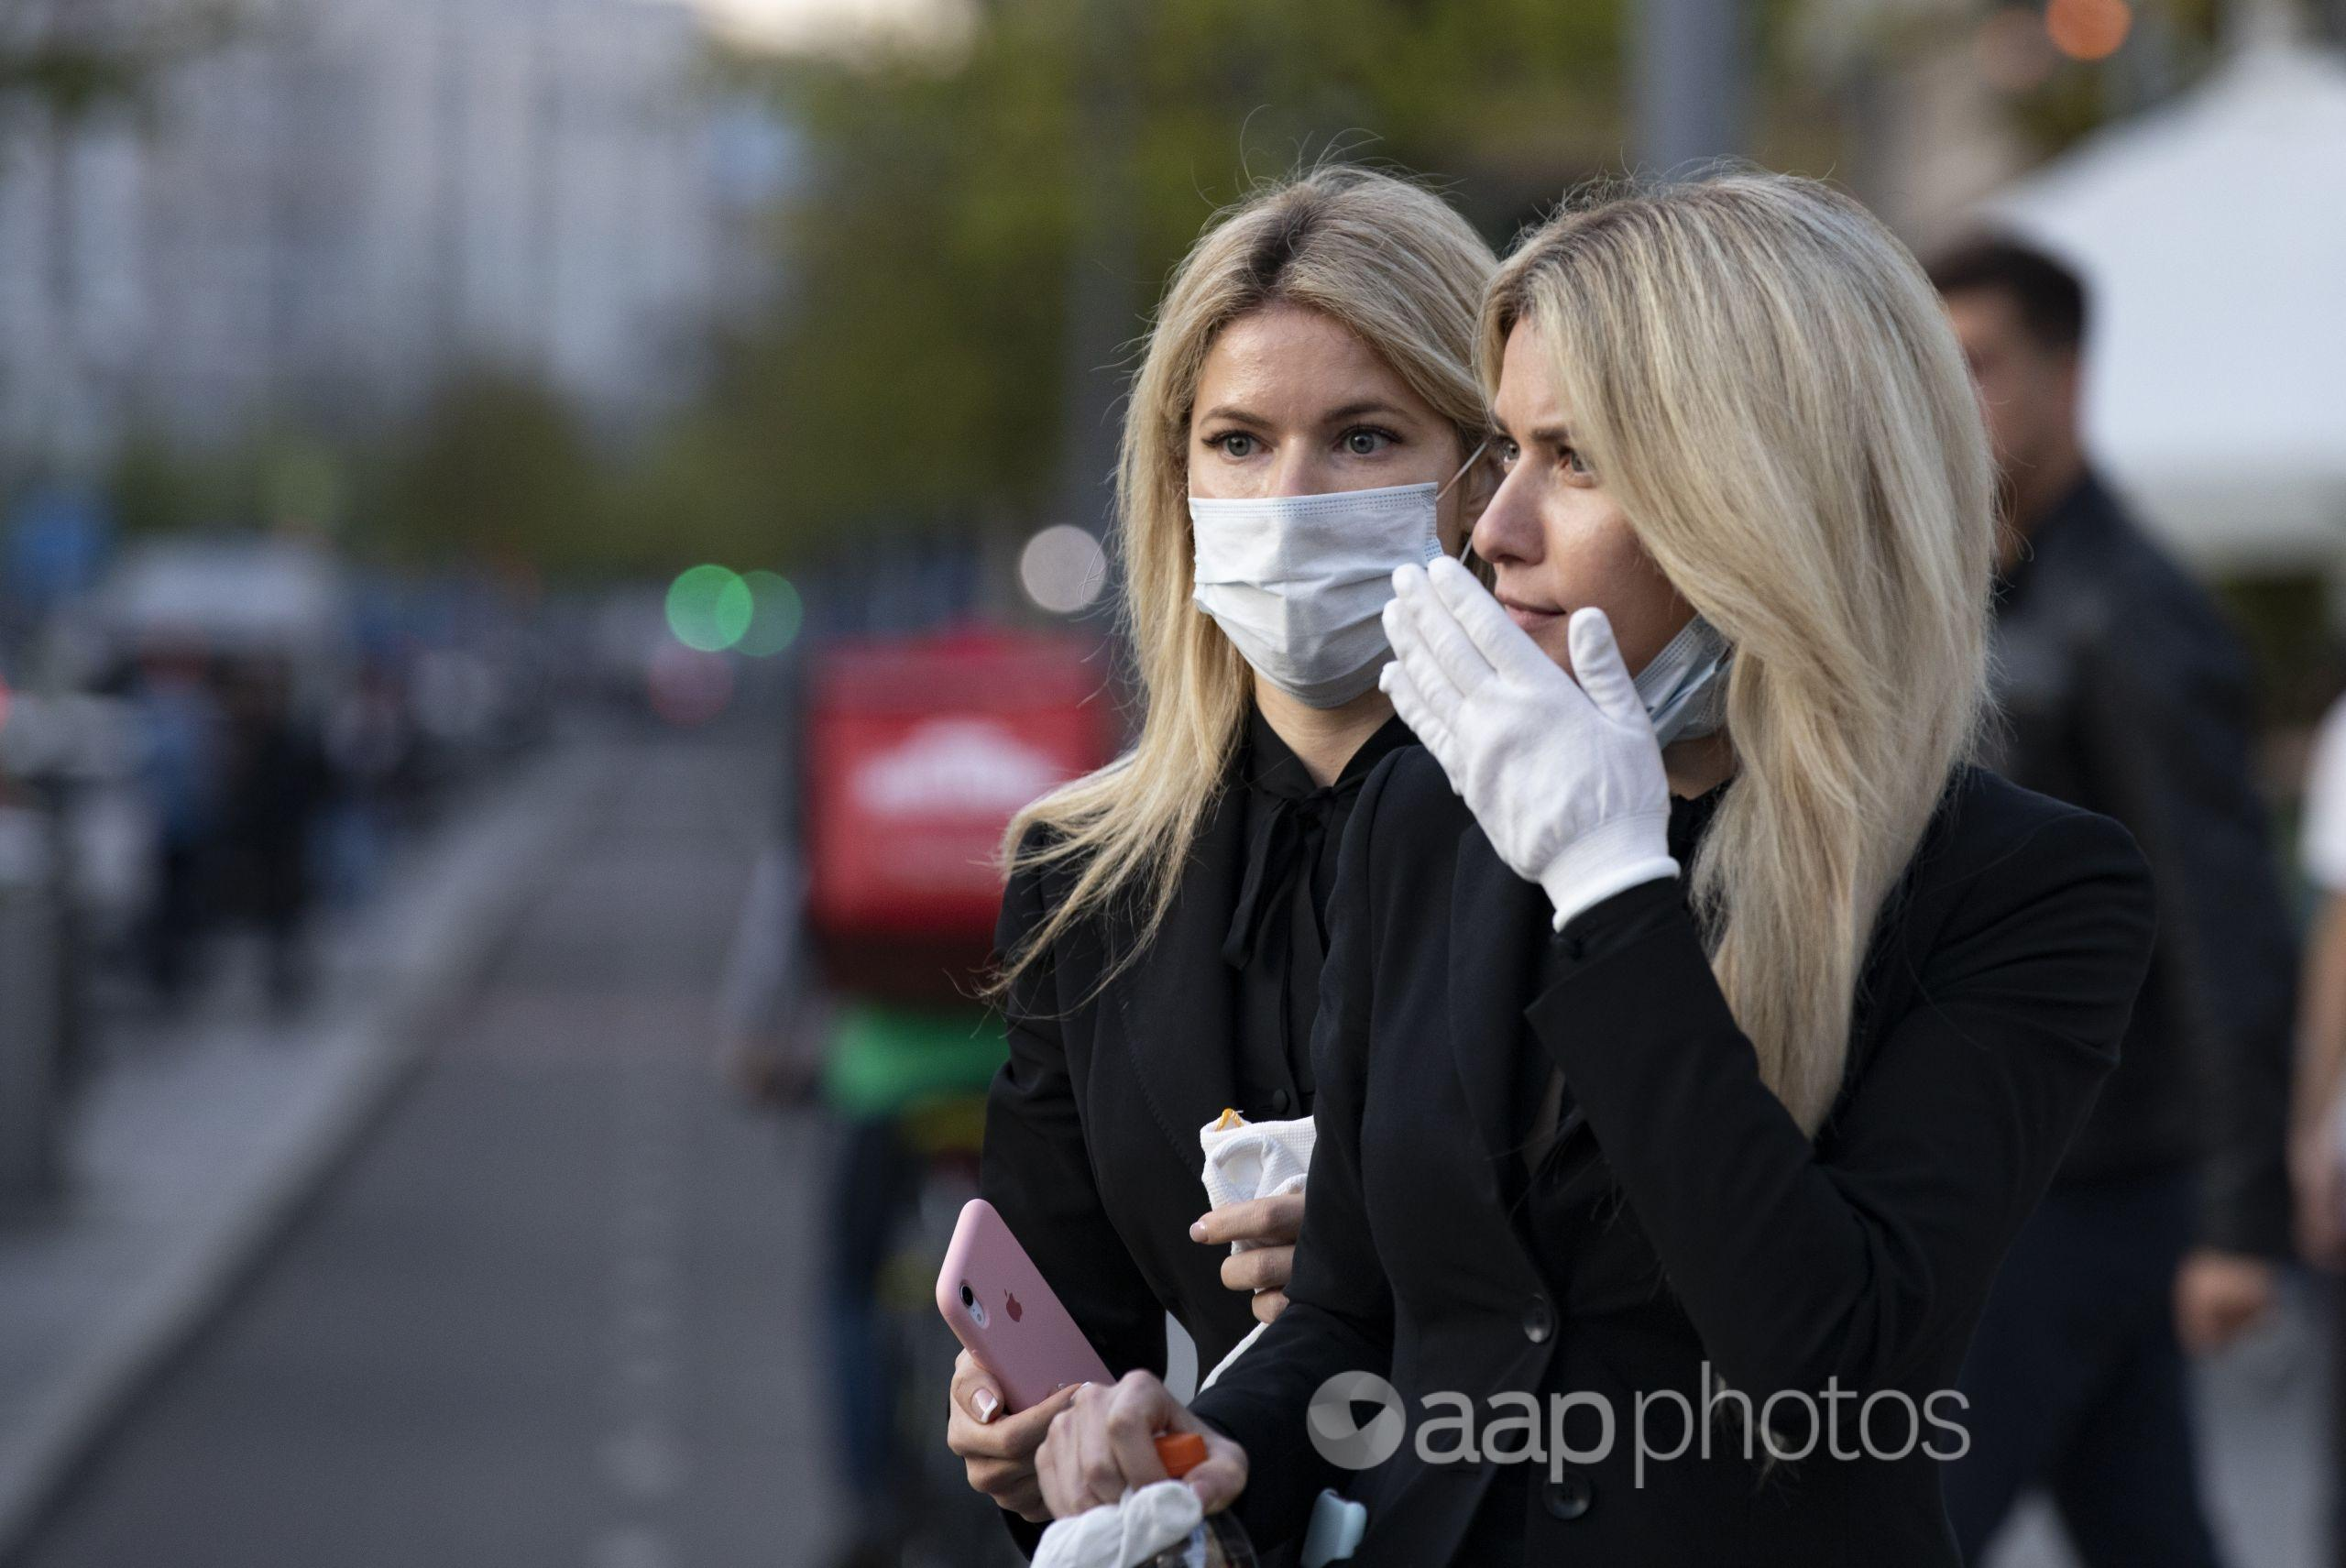 Two women wearing face masks against coronavirus